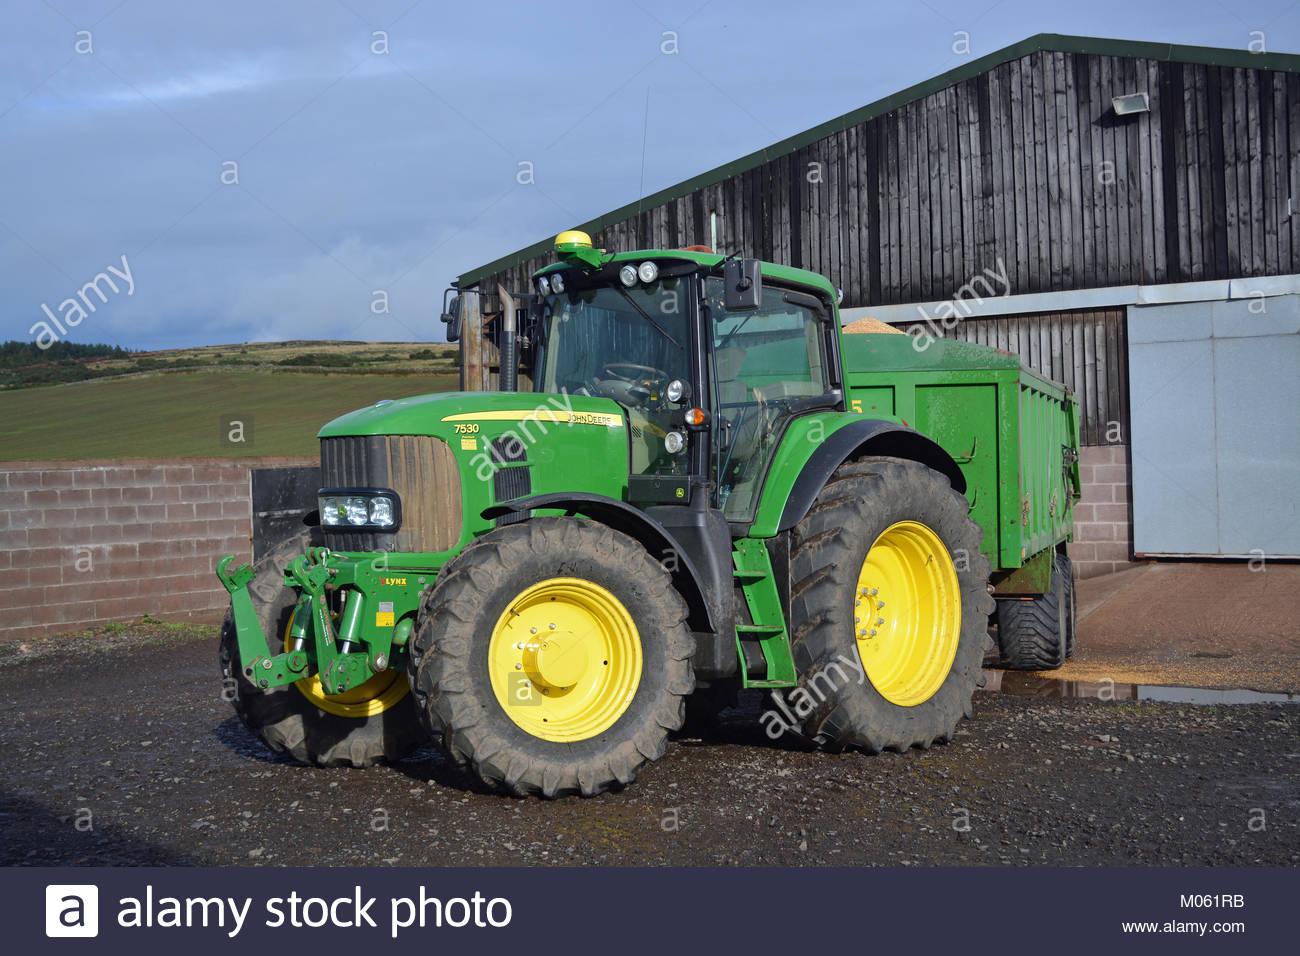 Green Tractor Photos & Green Tractor Images - Alamy serapportantà Dessin Animé De Tracteur John Deere